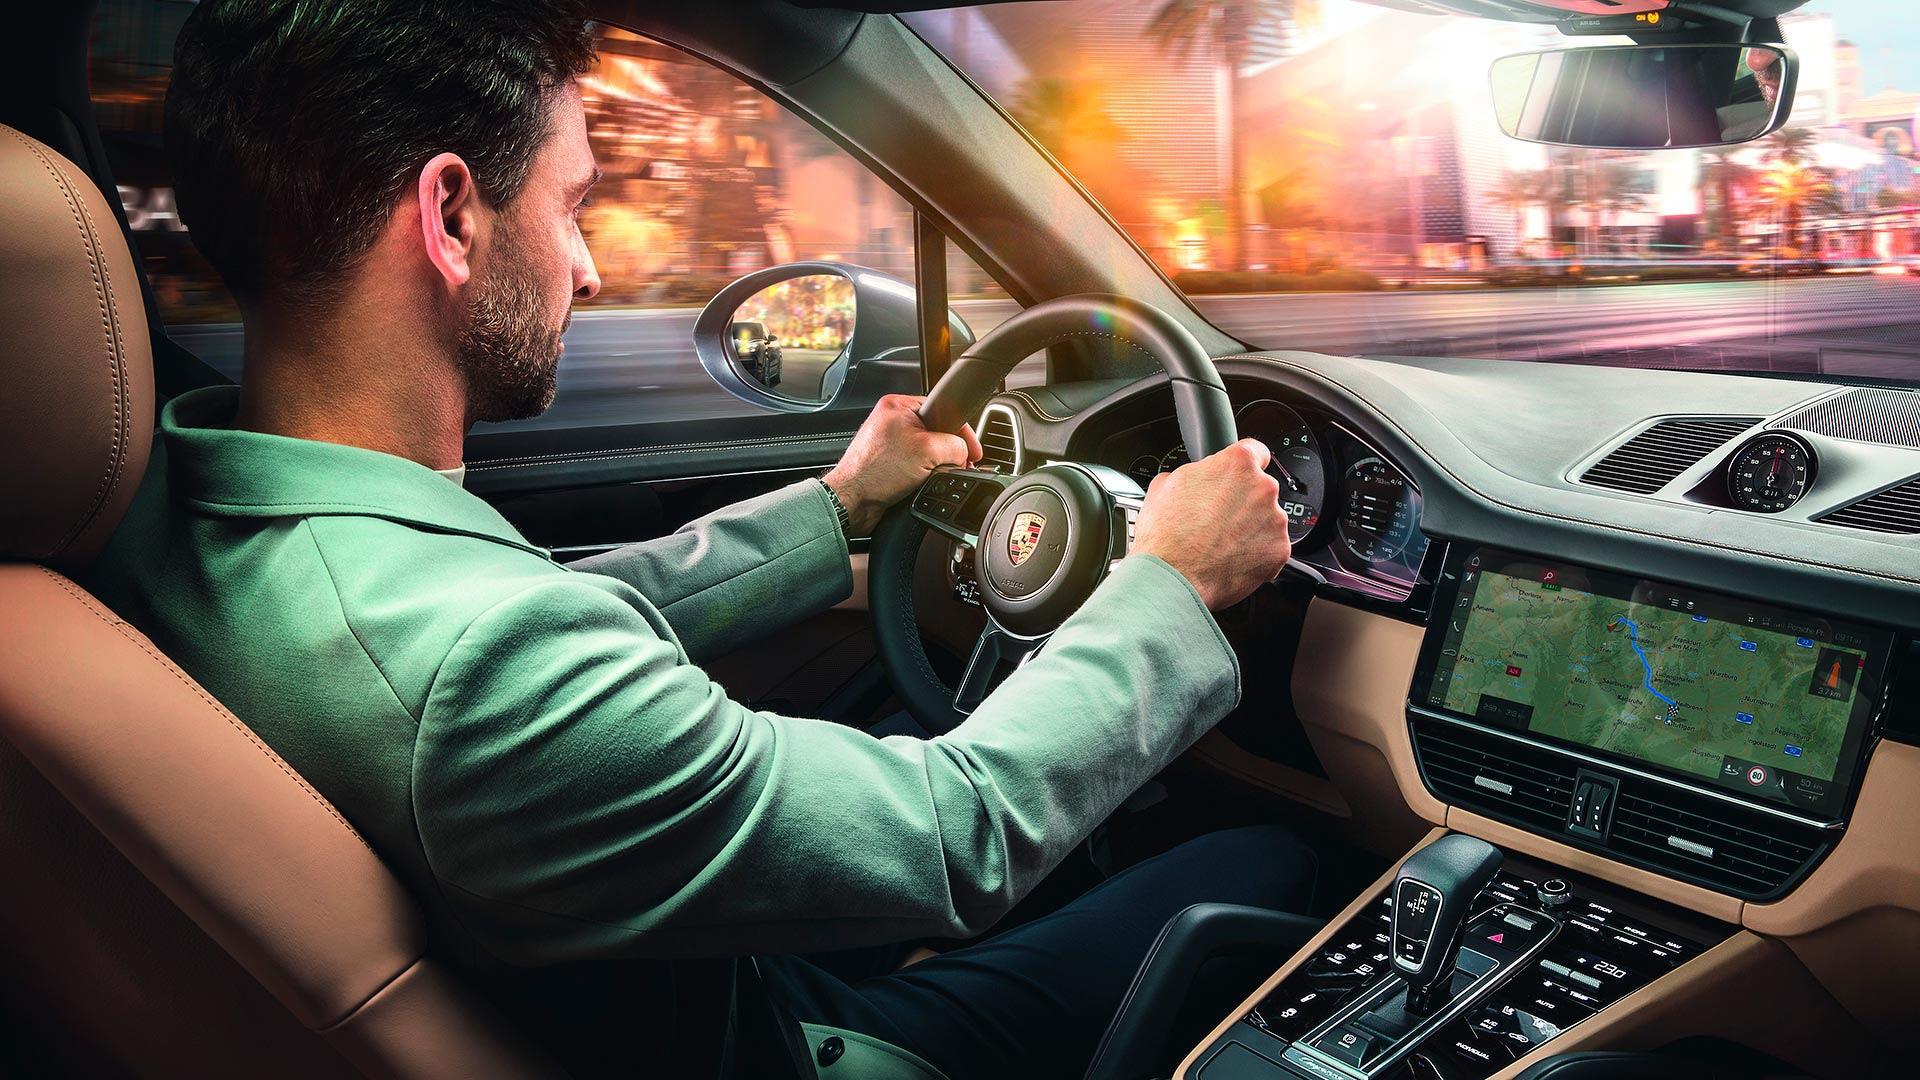 2019 Porsche Cayenne Is Always Online, Can Access Your Smart